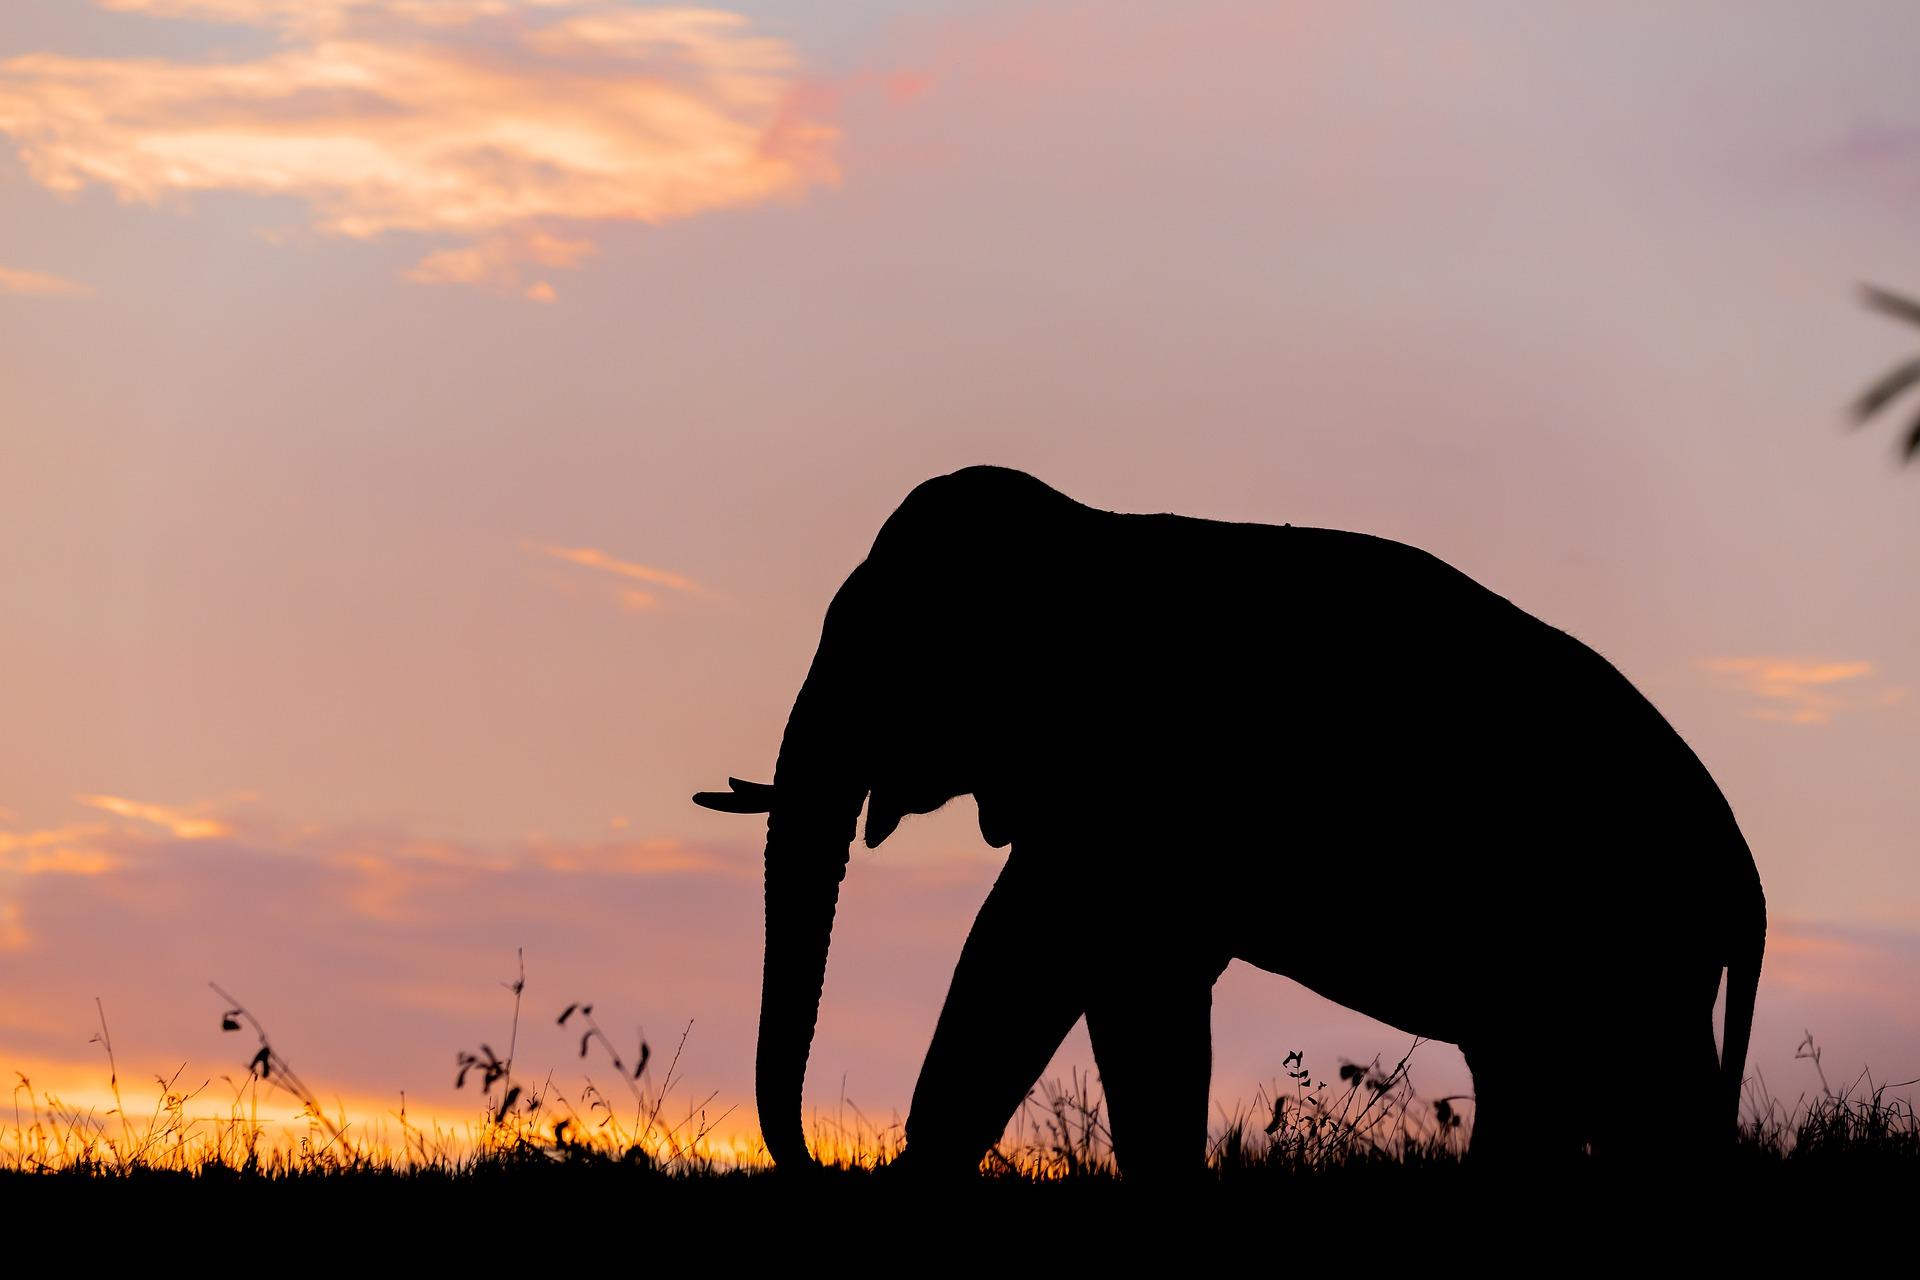 elephant_thailande_asie_sunset_coucher_soleil_ciel_ombre_kanchanaburi